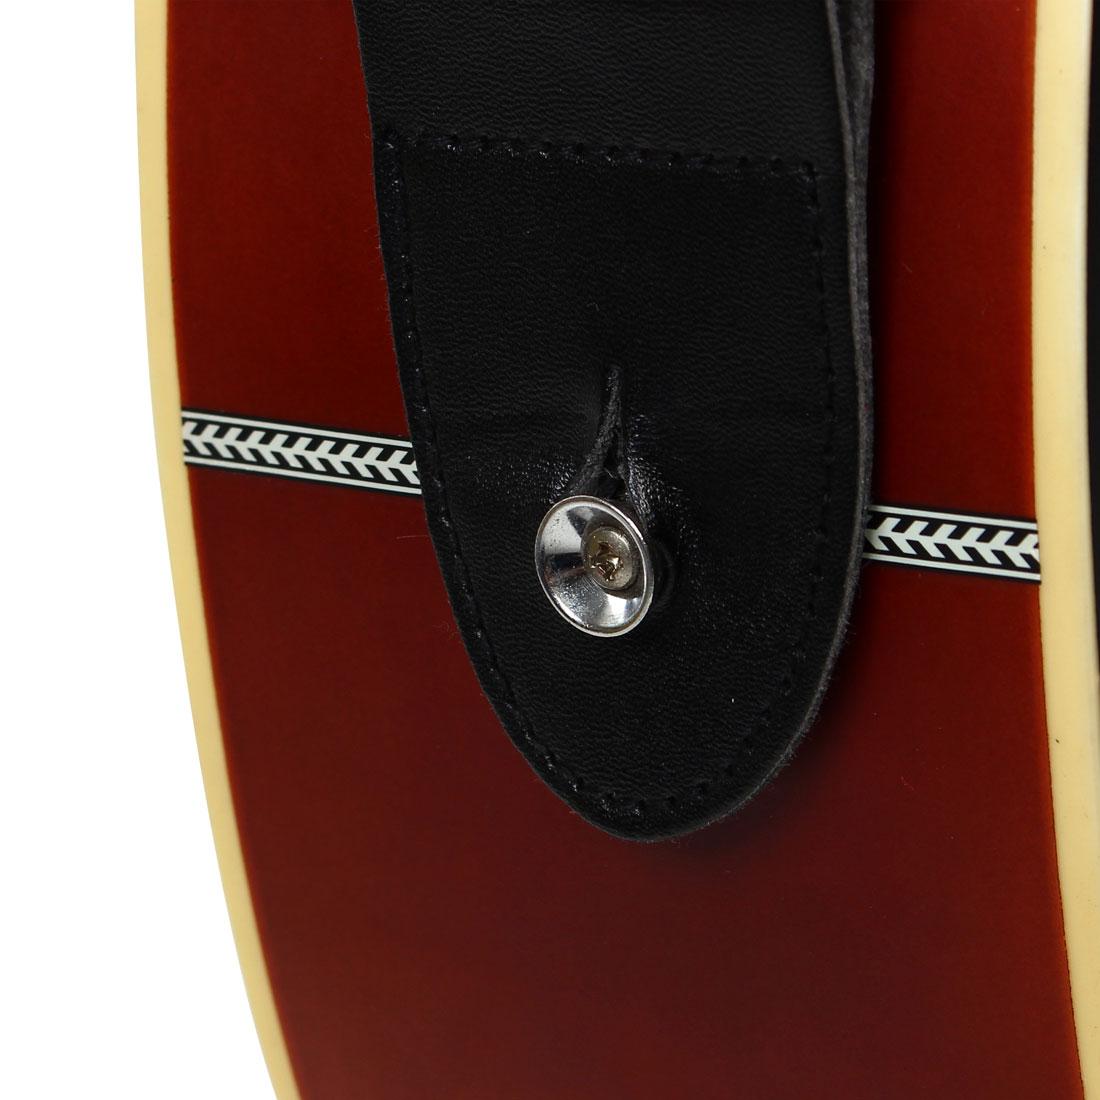 Nylon Bass Belt Adjustable Electric Guitar Strap 80-140cm Length Green - image 3 de 6